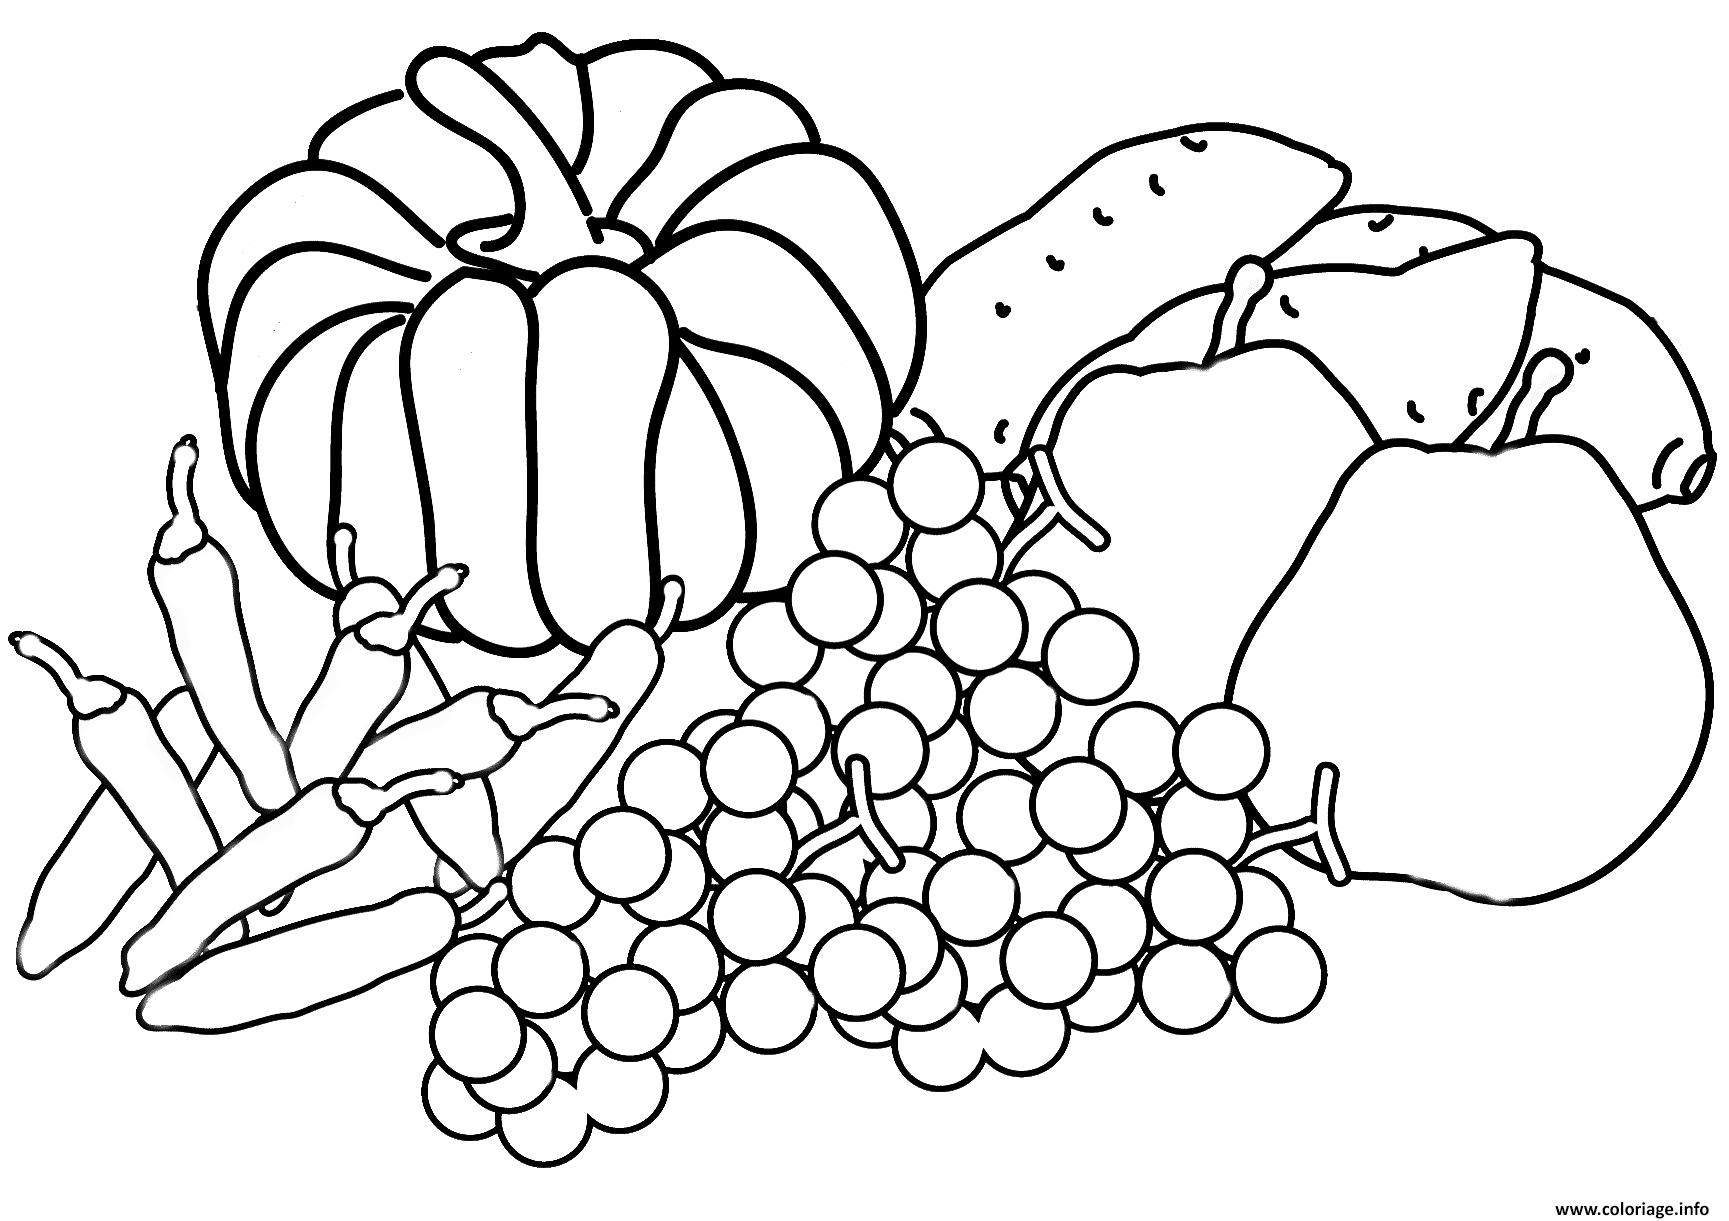 Coloriage Automne Harvest Coloring Page Fall Jecolorie Com